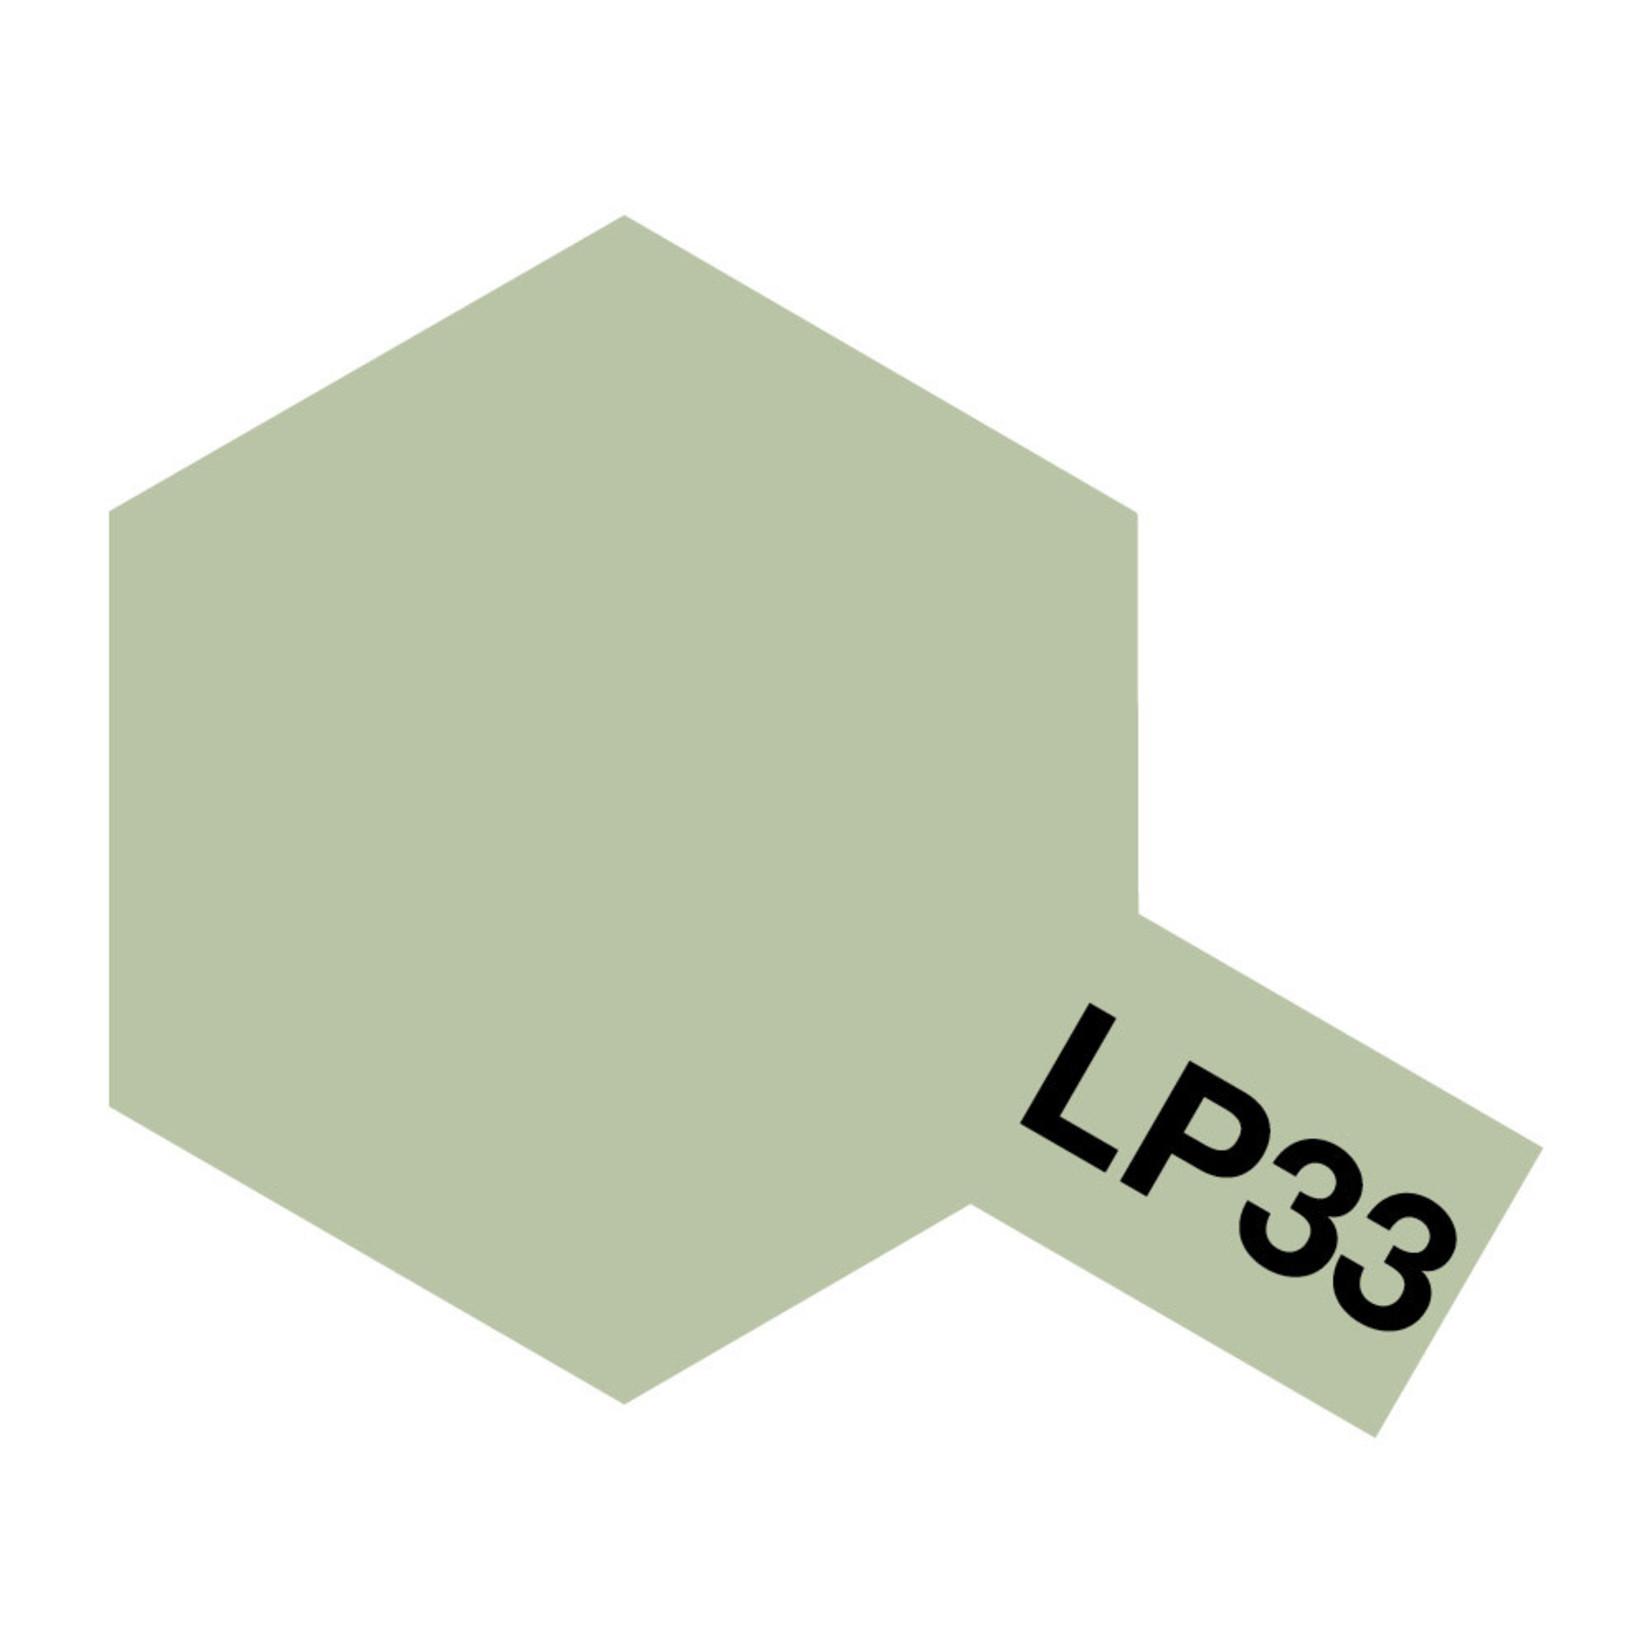 Tamiya TAMLP33 Lacquer Gray Green (10ml)